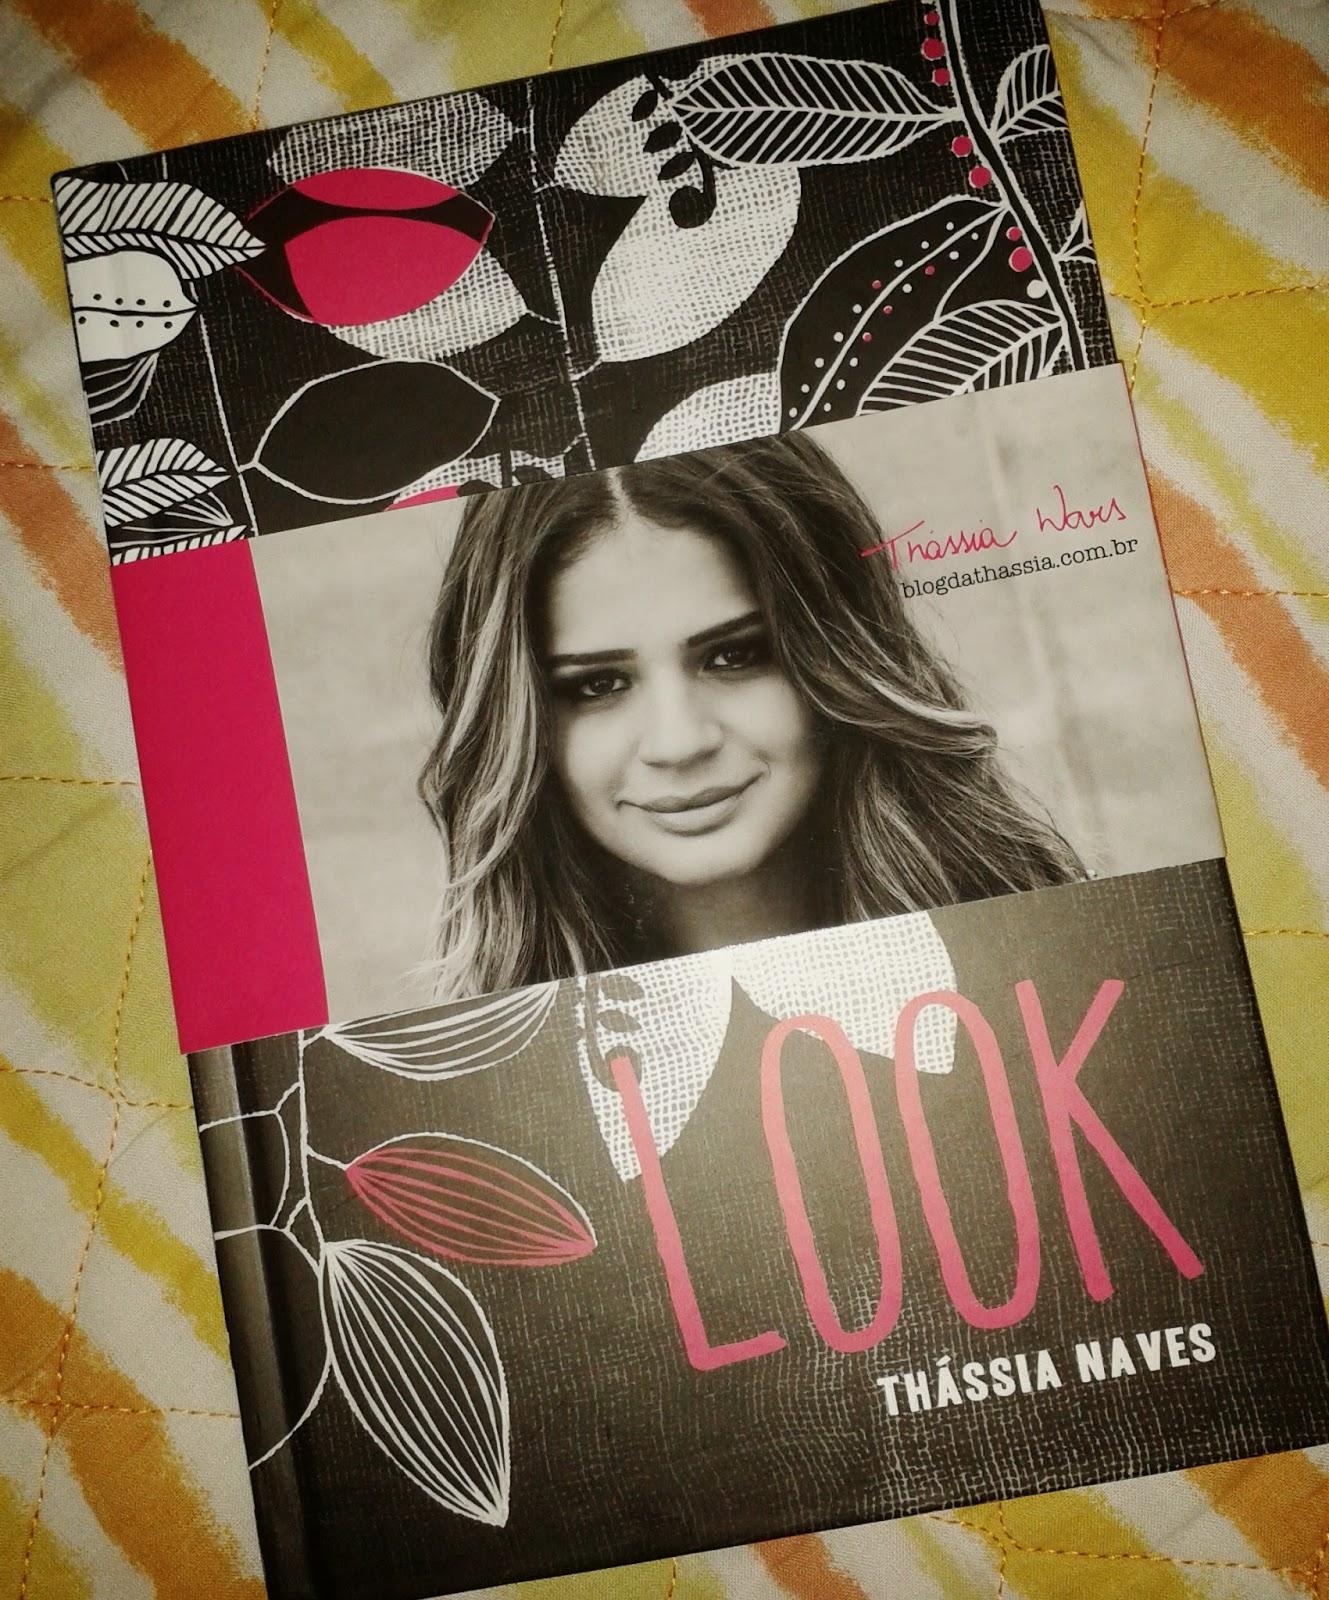 DICA DE LEITURA: LOOK THÁSSIA NAVES